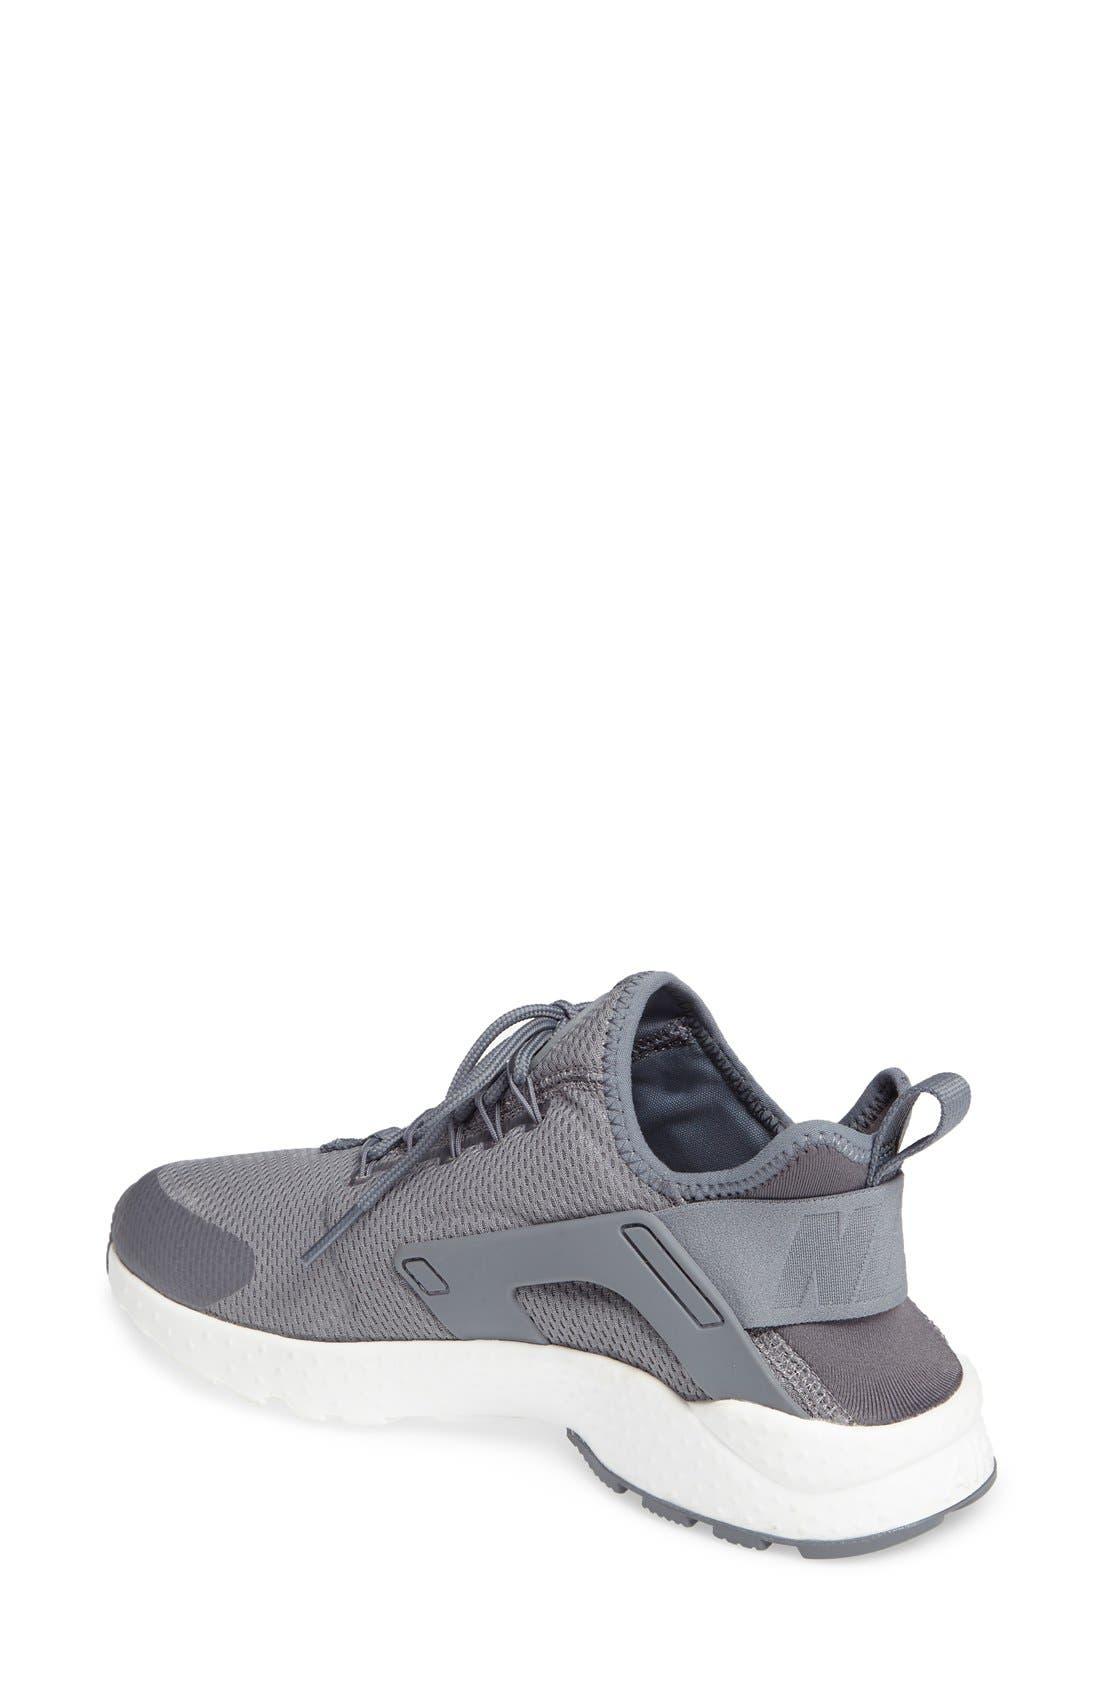 Air Huarache Sneaker,                             Alternate thumbnail 129, color,